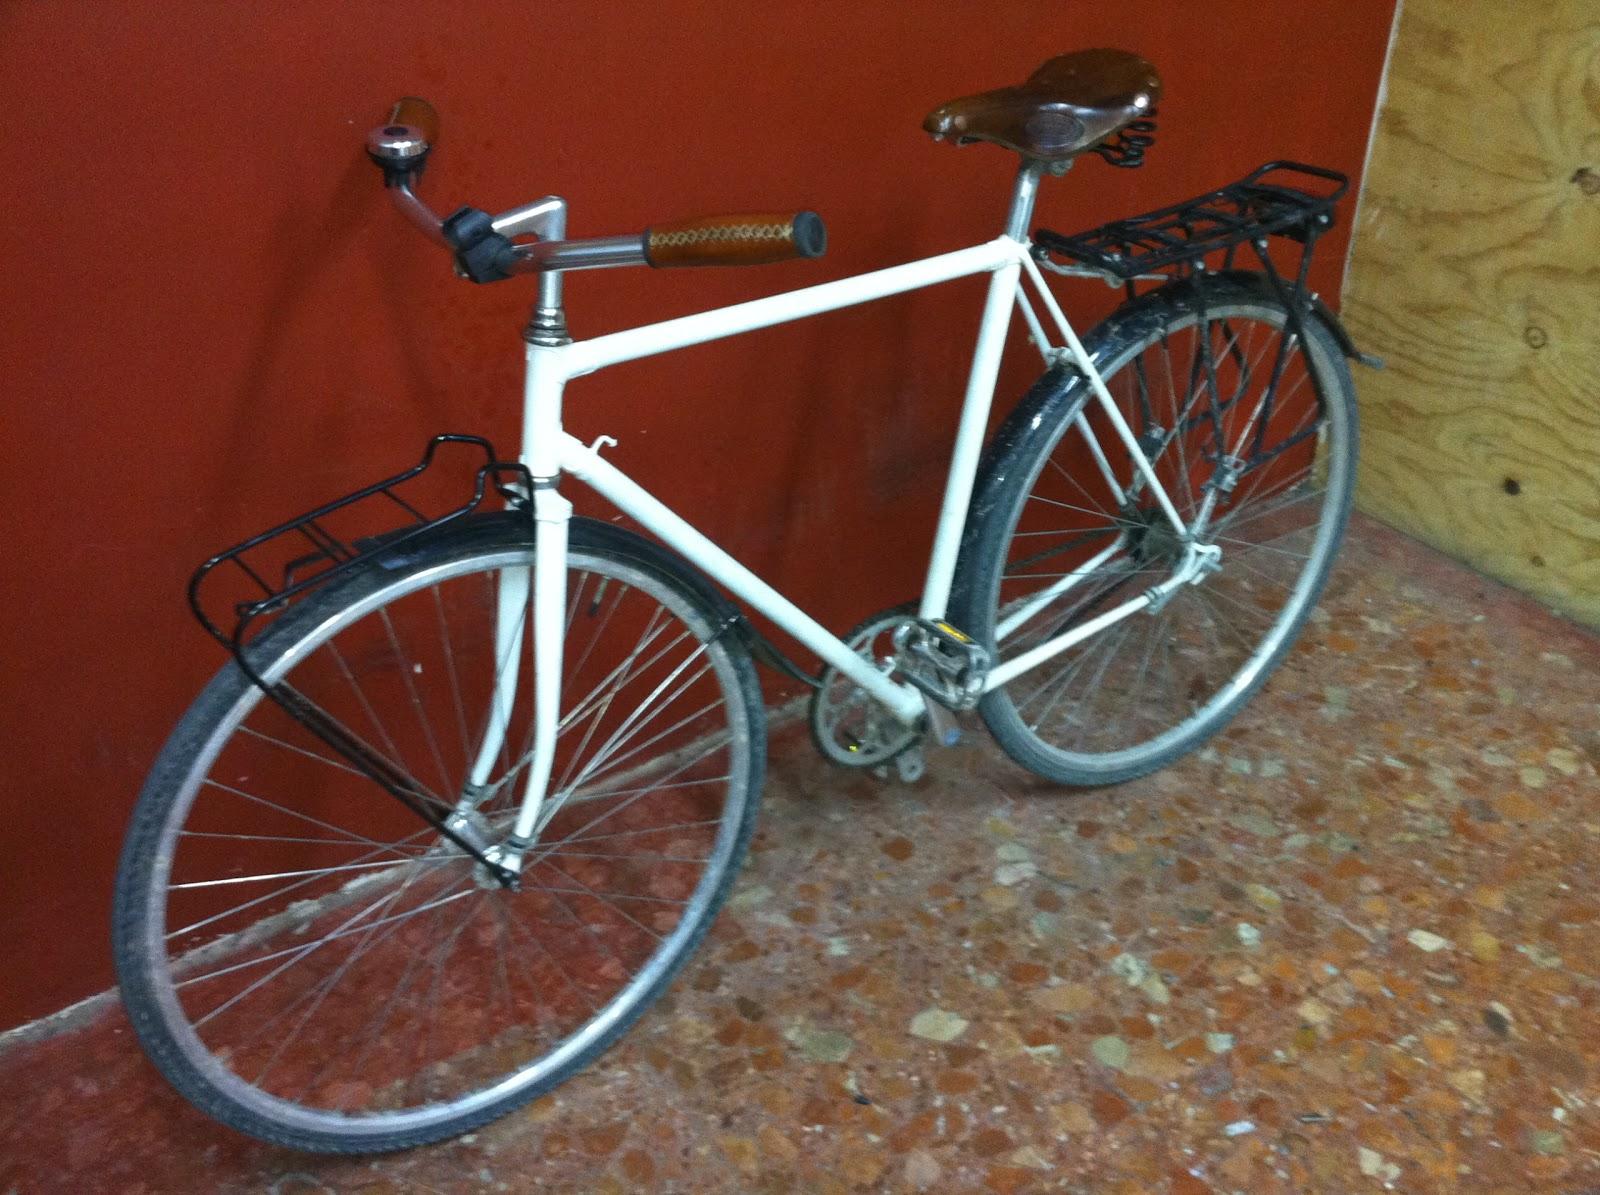 Anttaller: La bicicleta del abuelo